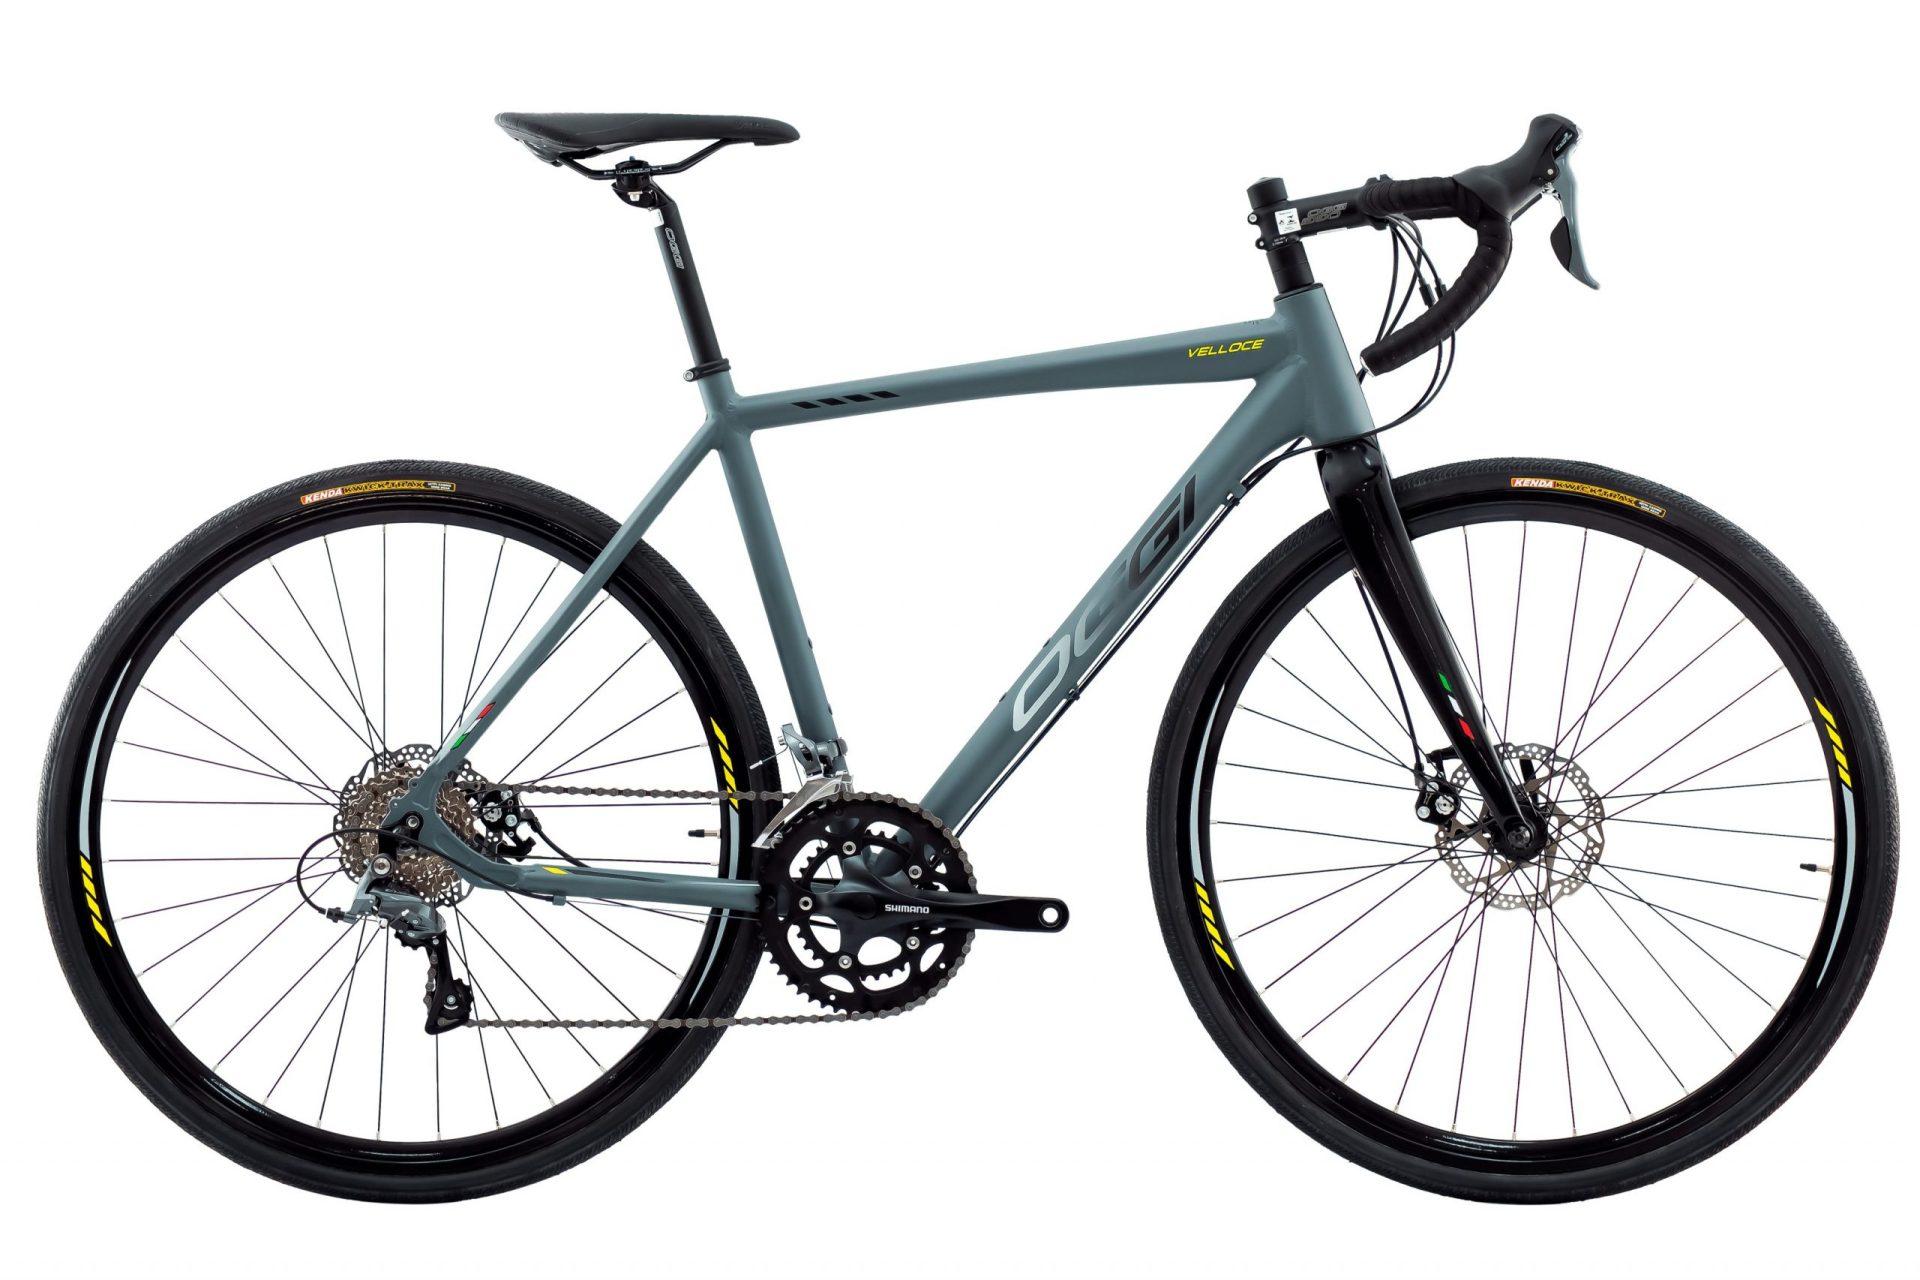 Bicicleta speed barata, Oggi Velloce Disc 2022